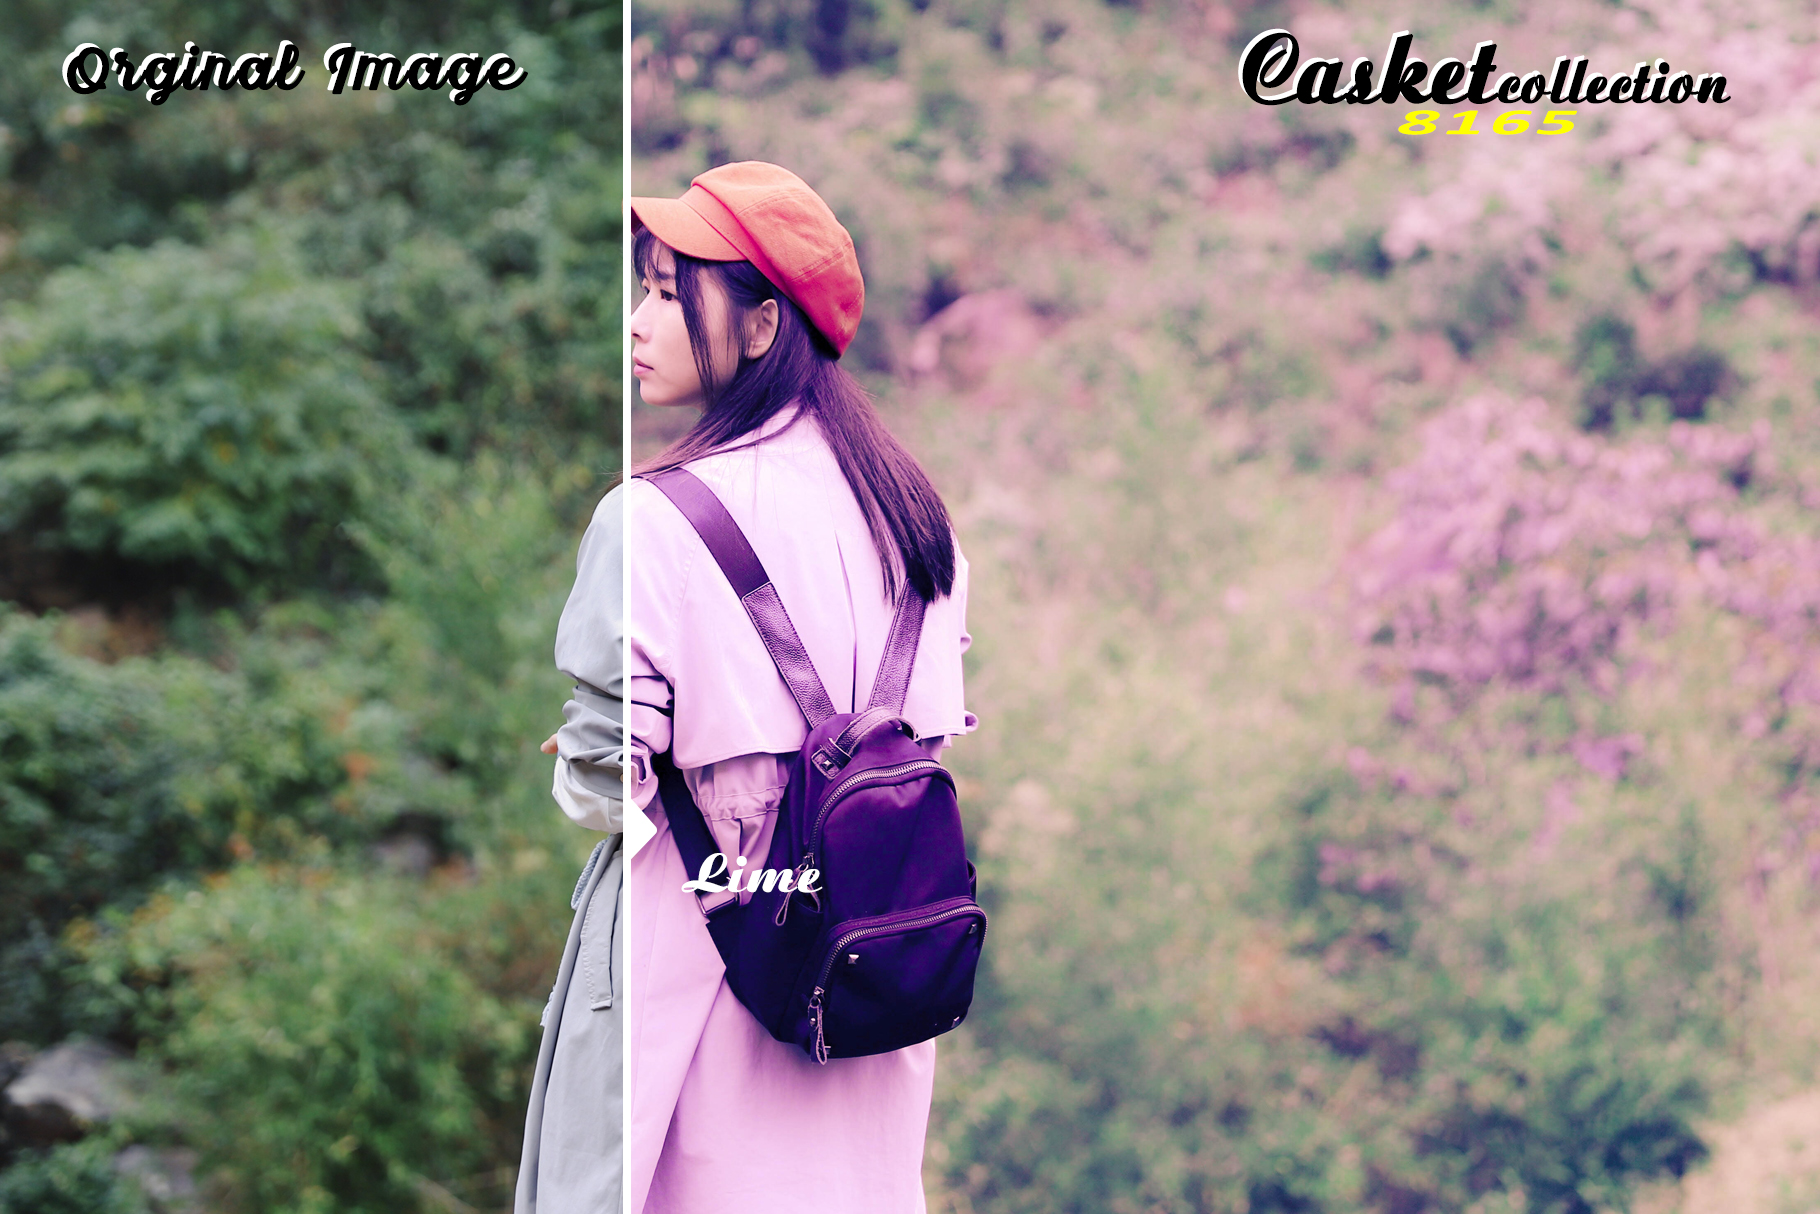 Casket Collection Lightroom Presets example image 7